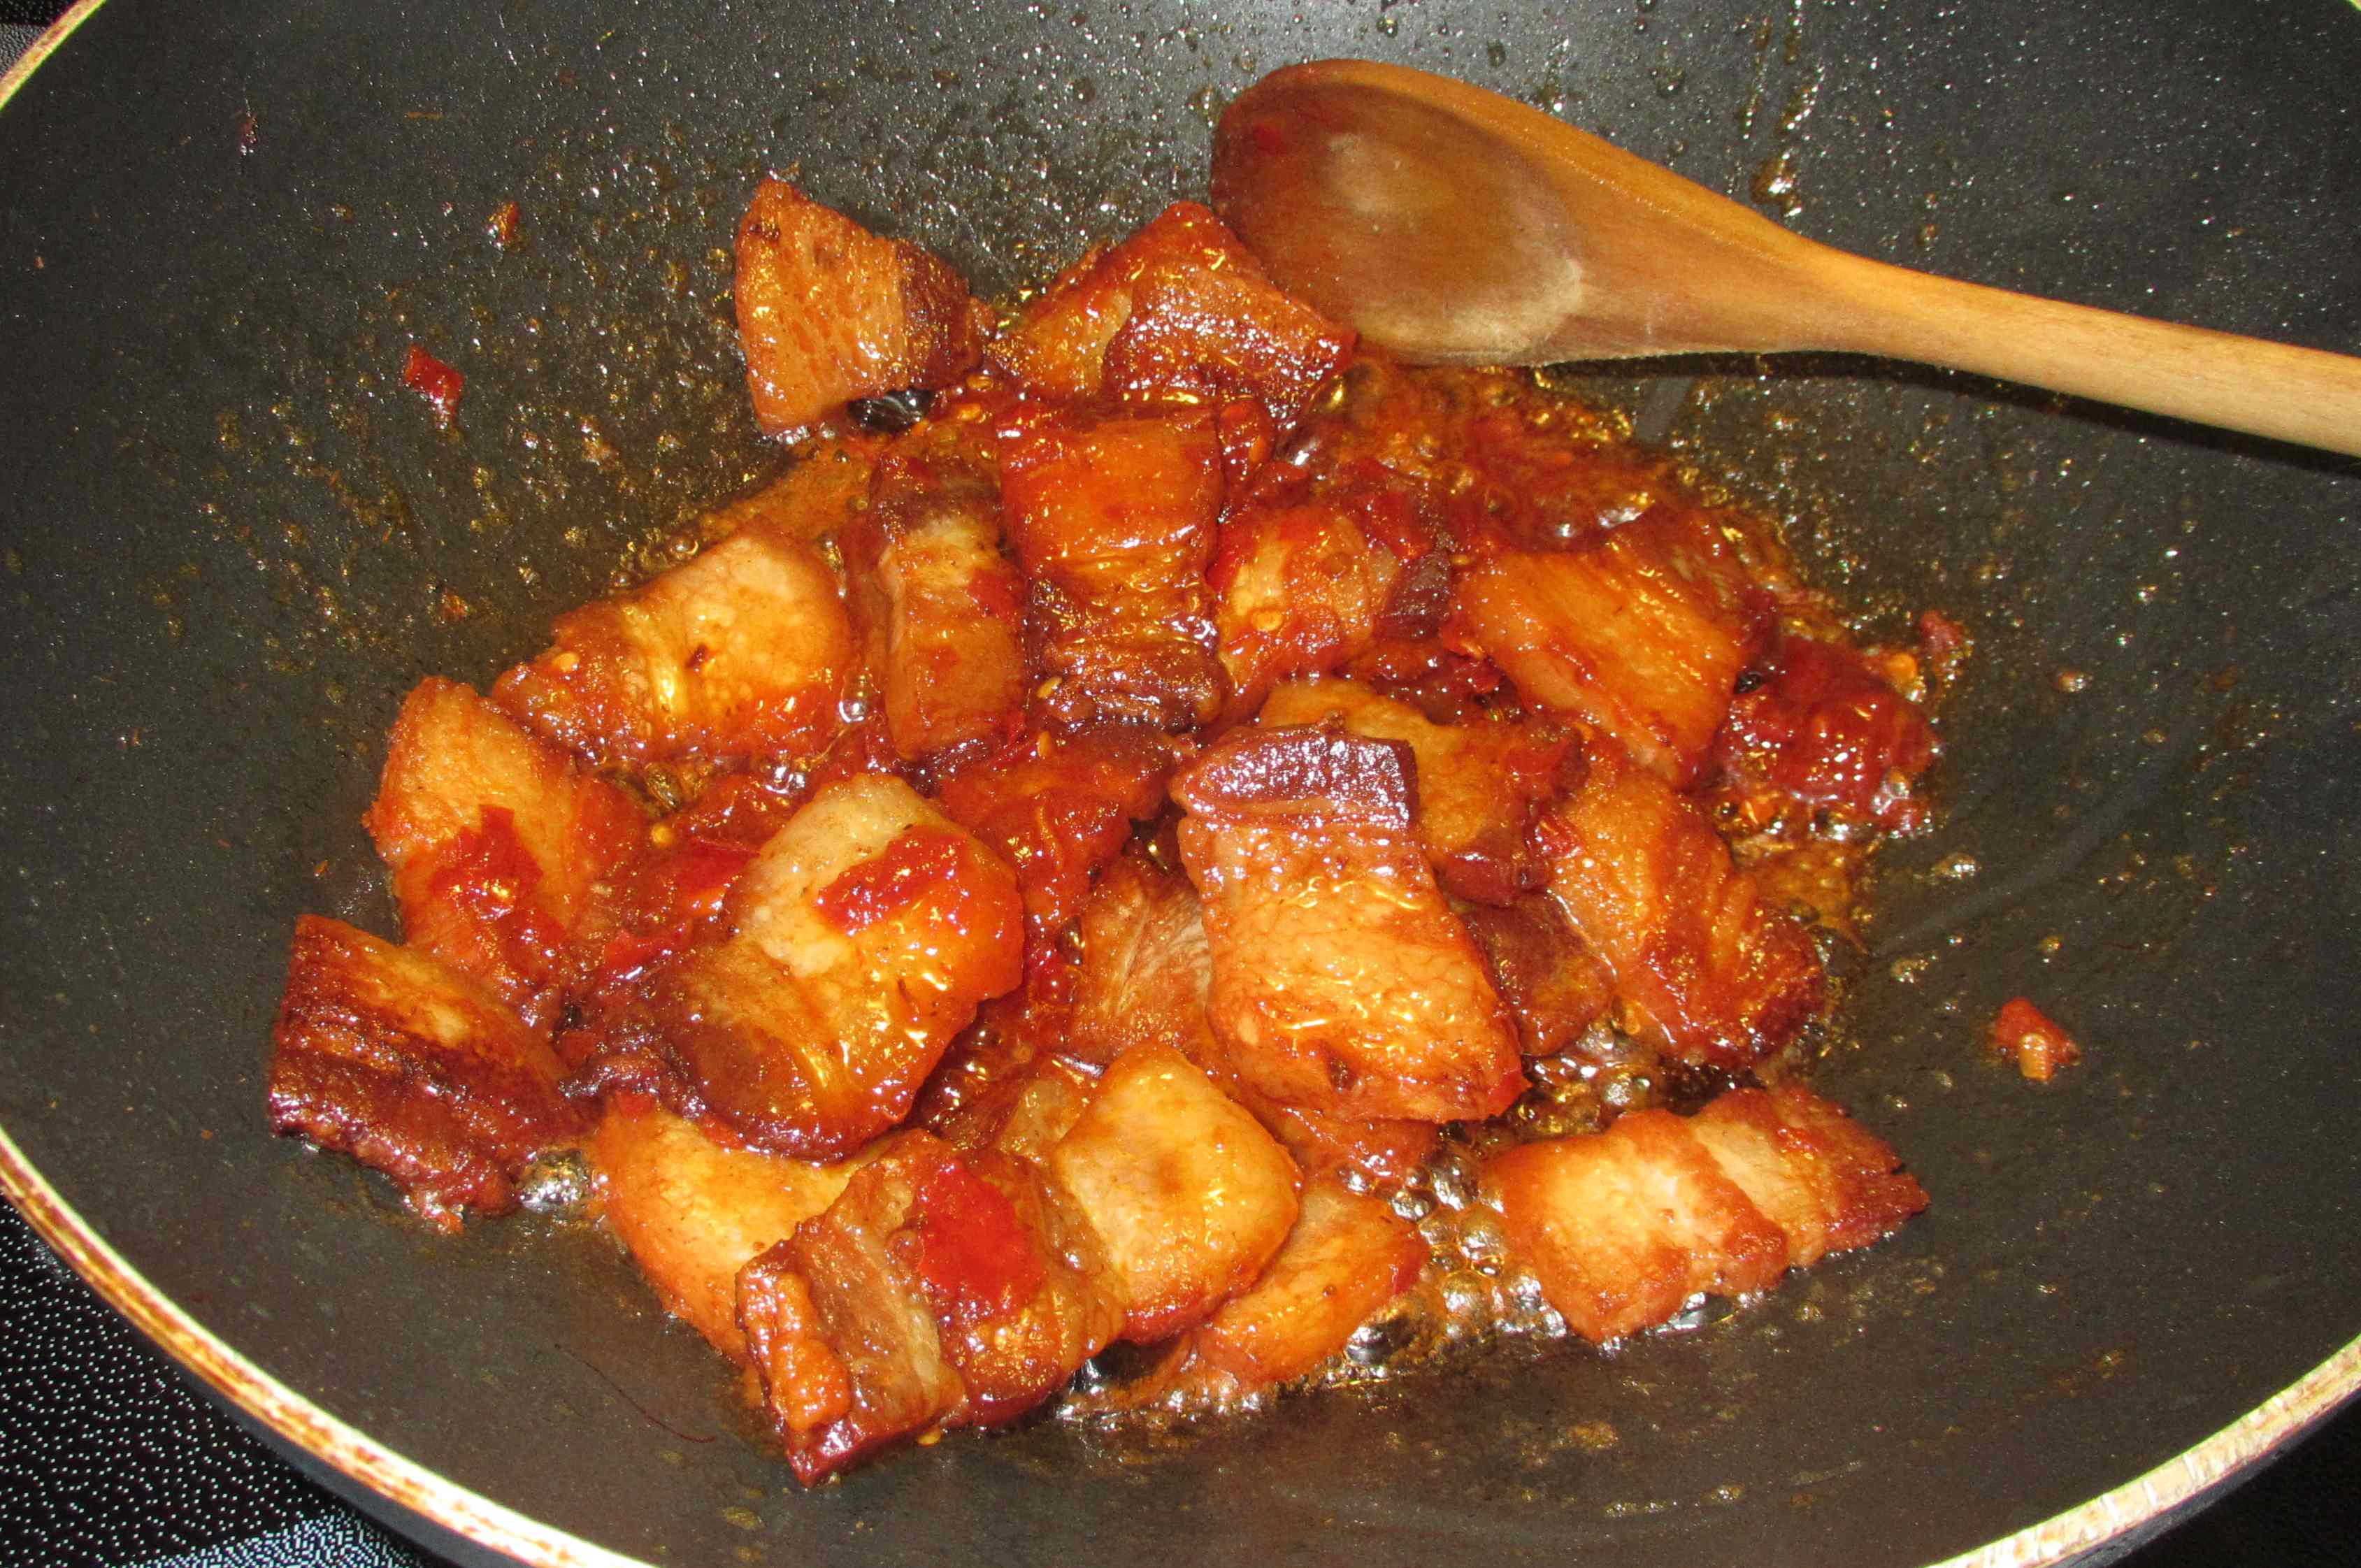 Bbq pork belly slices recipes